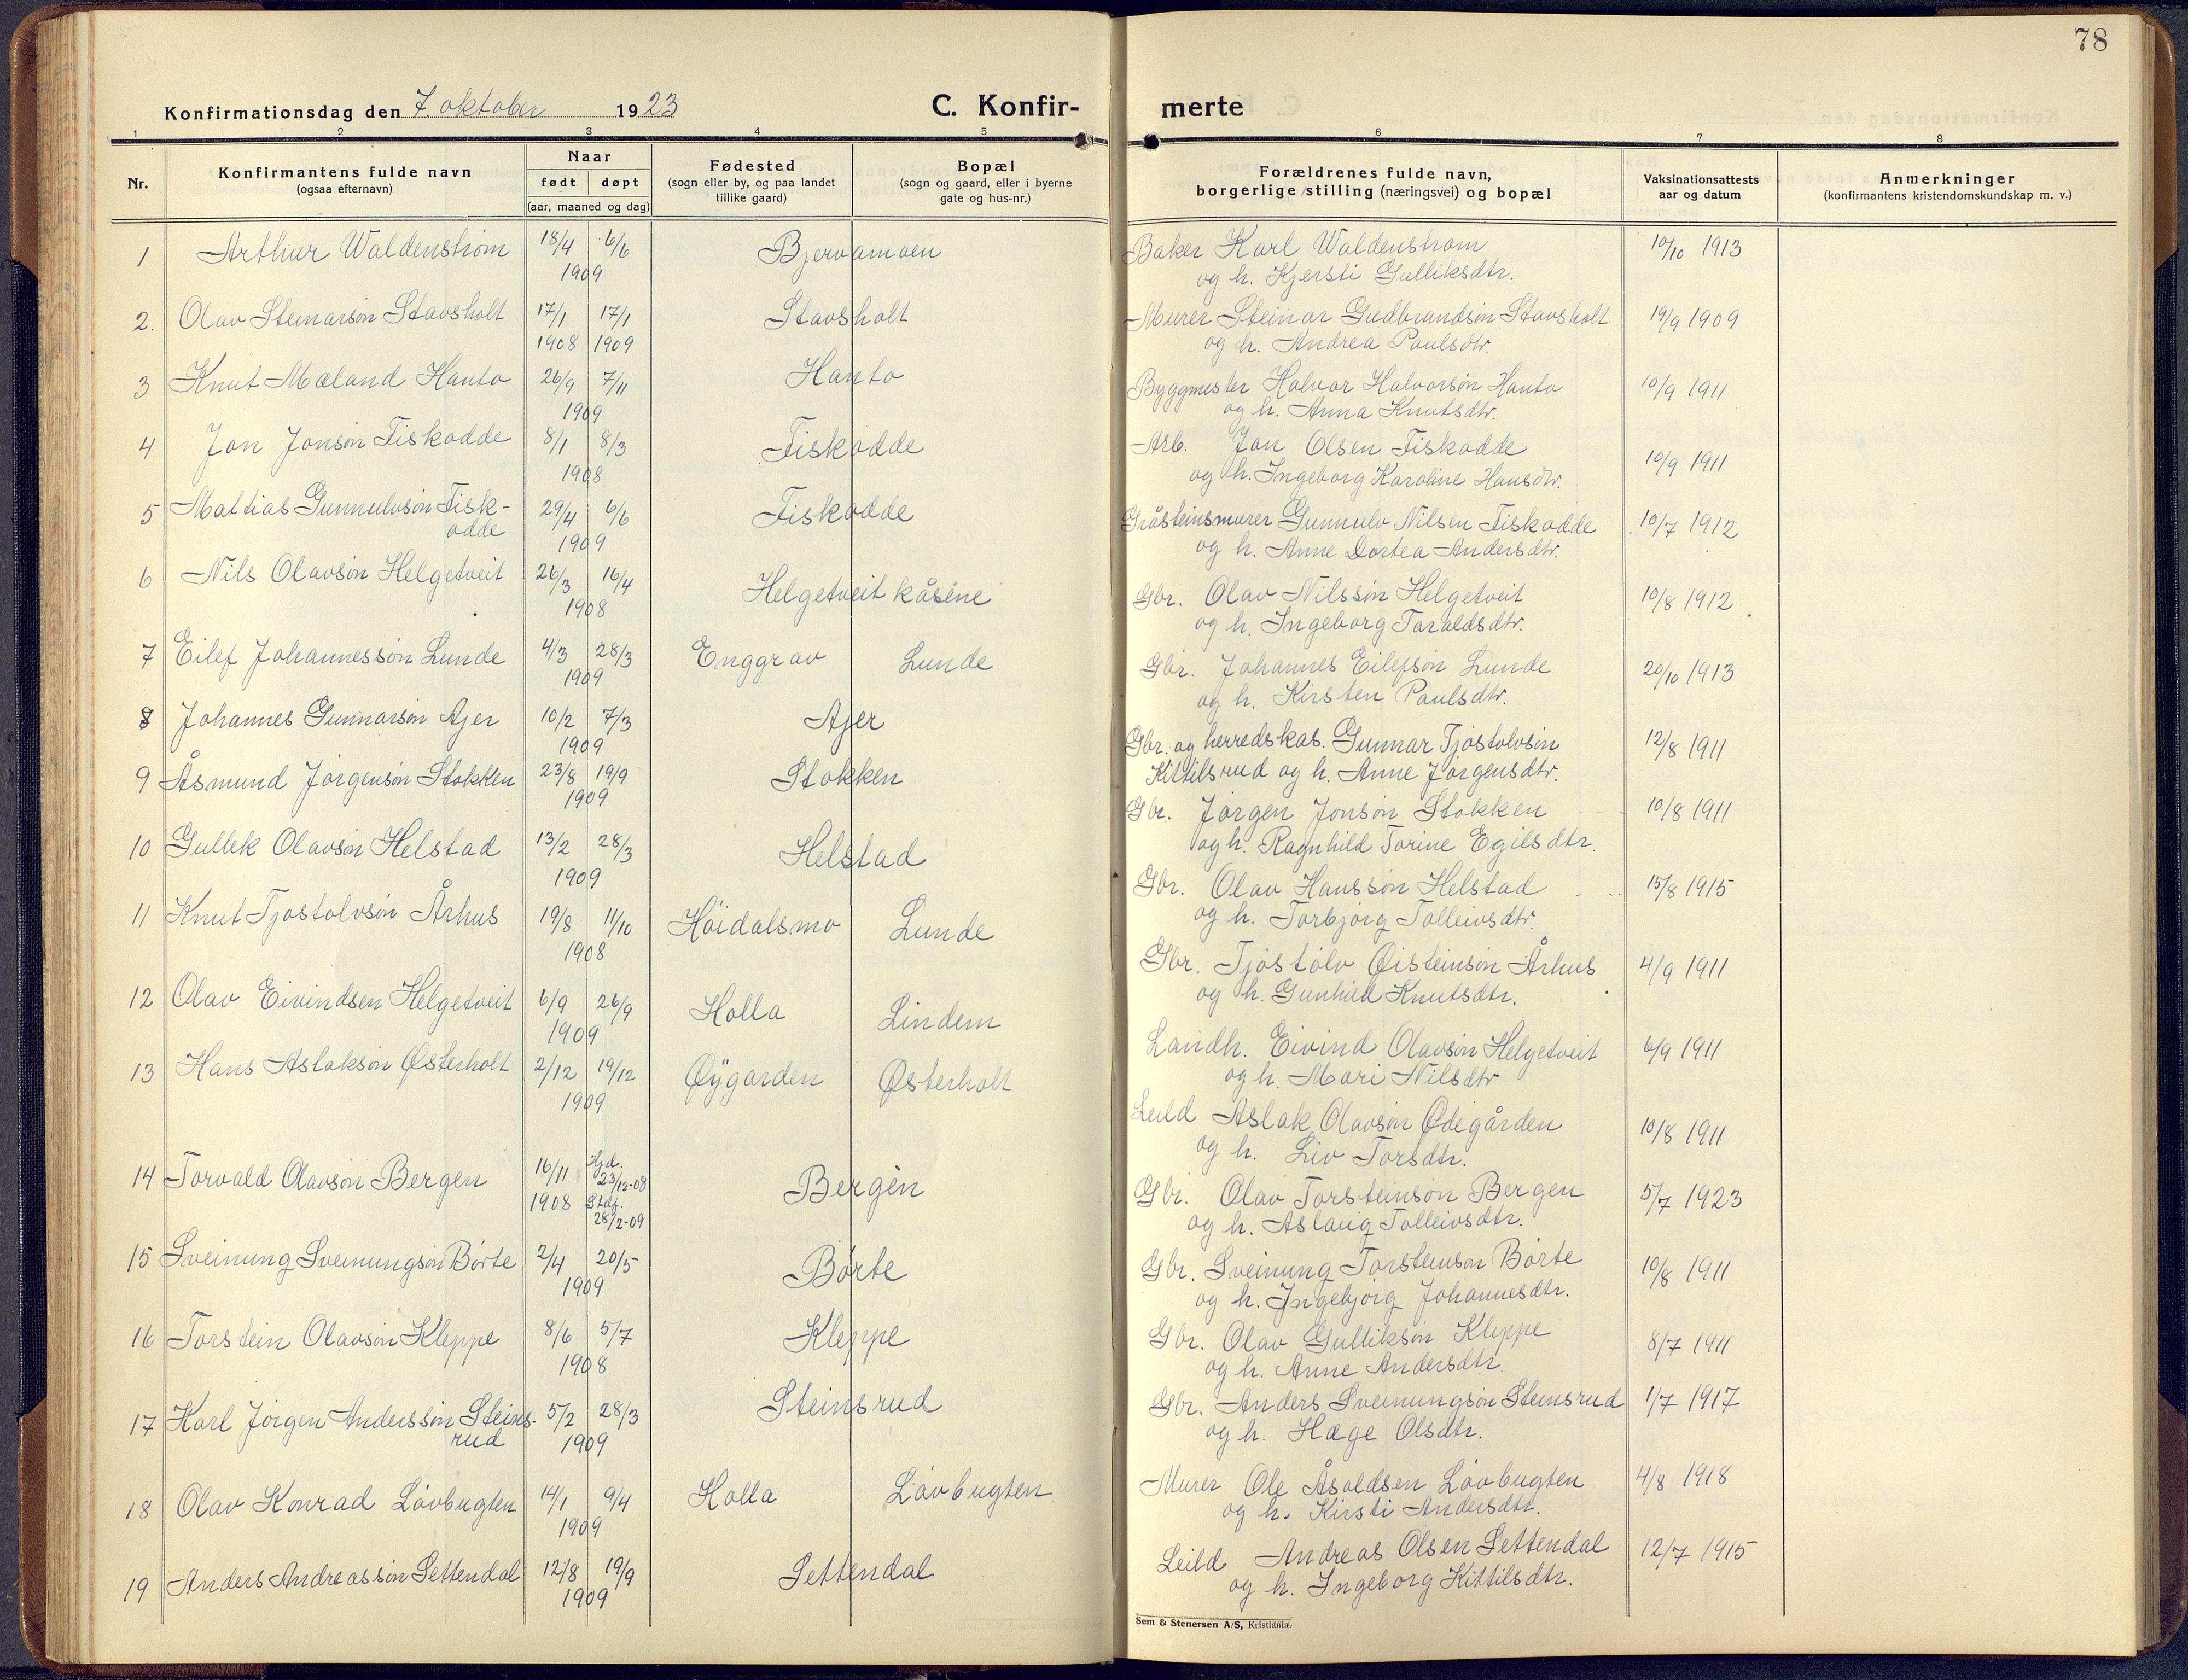 SAKO, Lunde kirkebøker, F/Fa/L0006: Ministerialbok nr. I 6, 1922-1940, s. 78